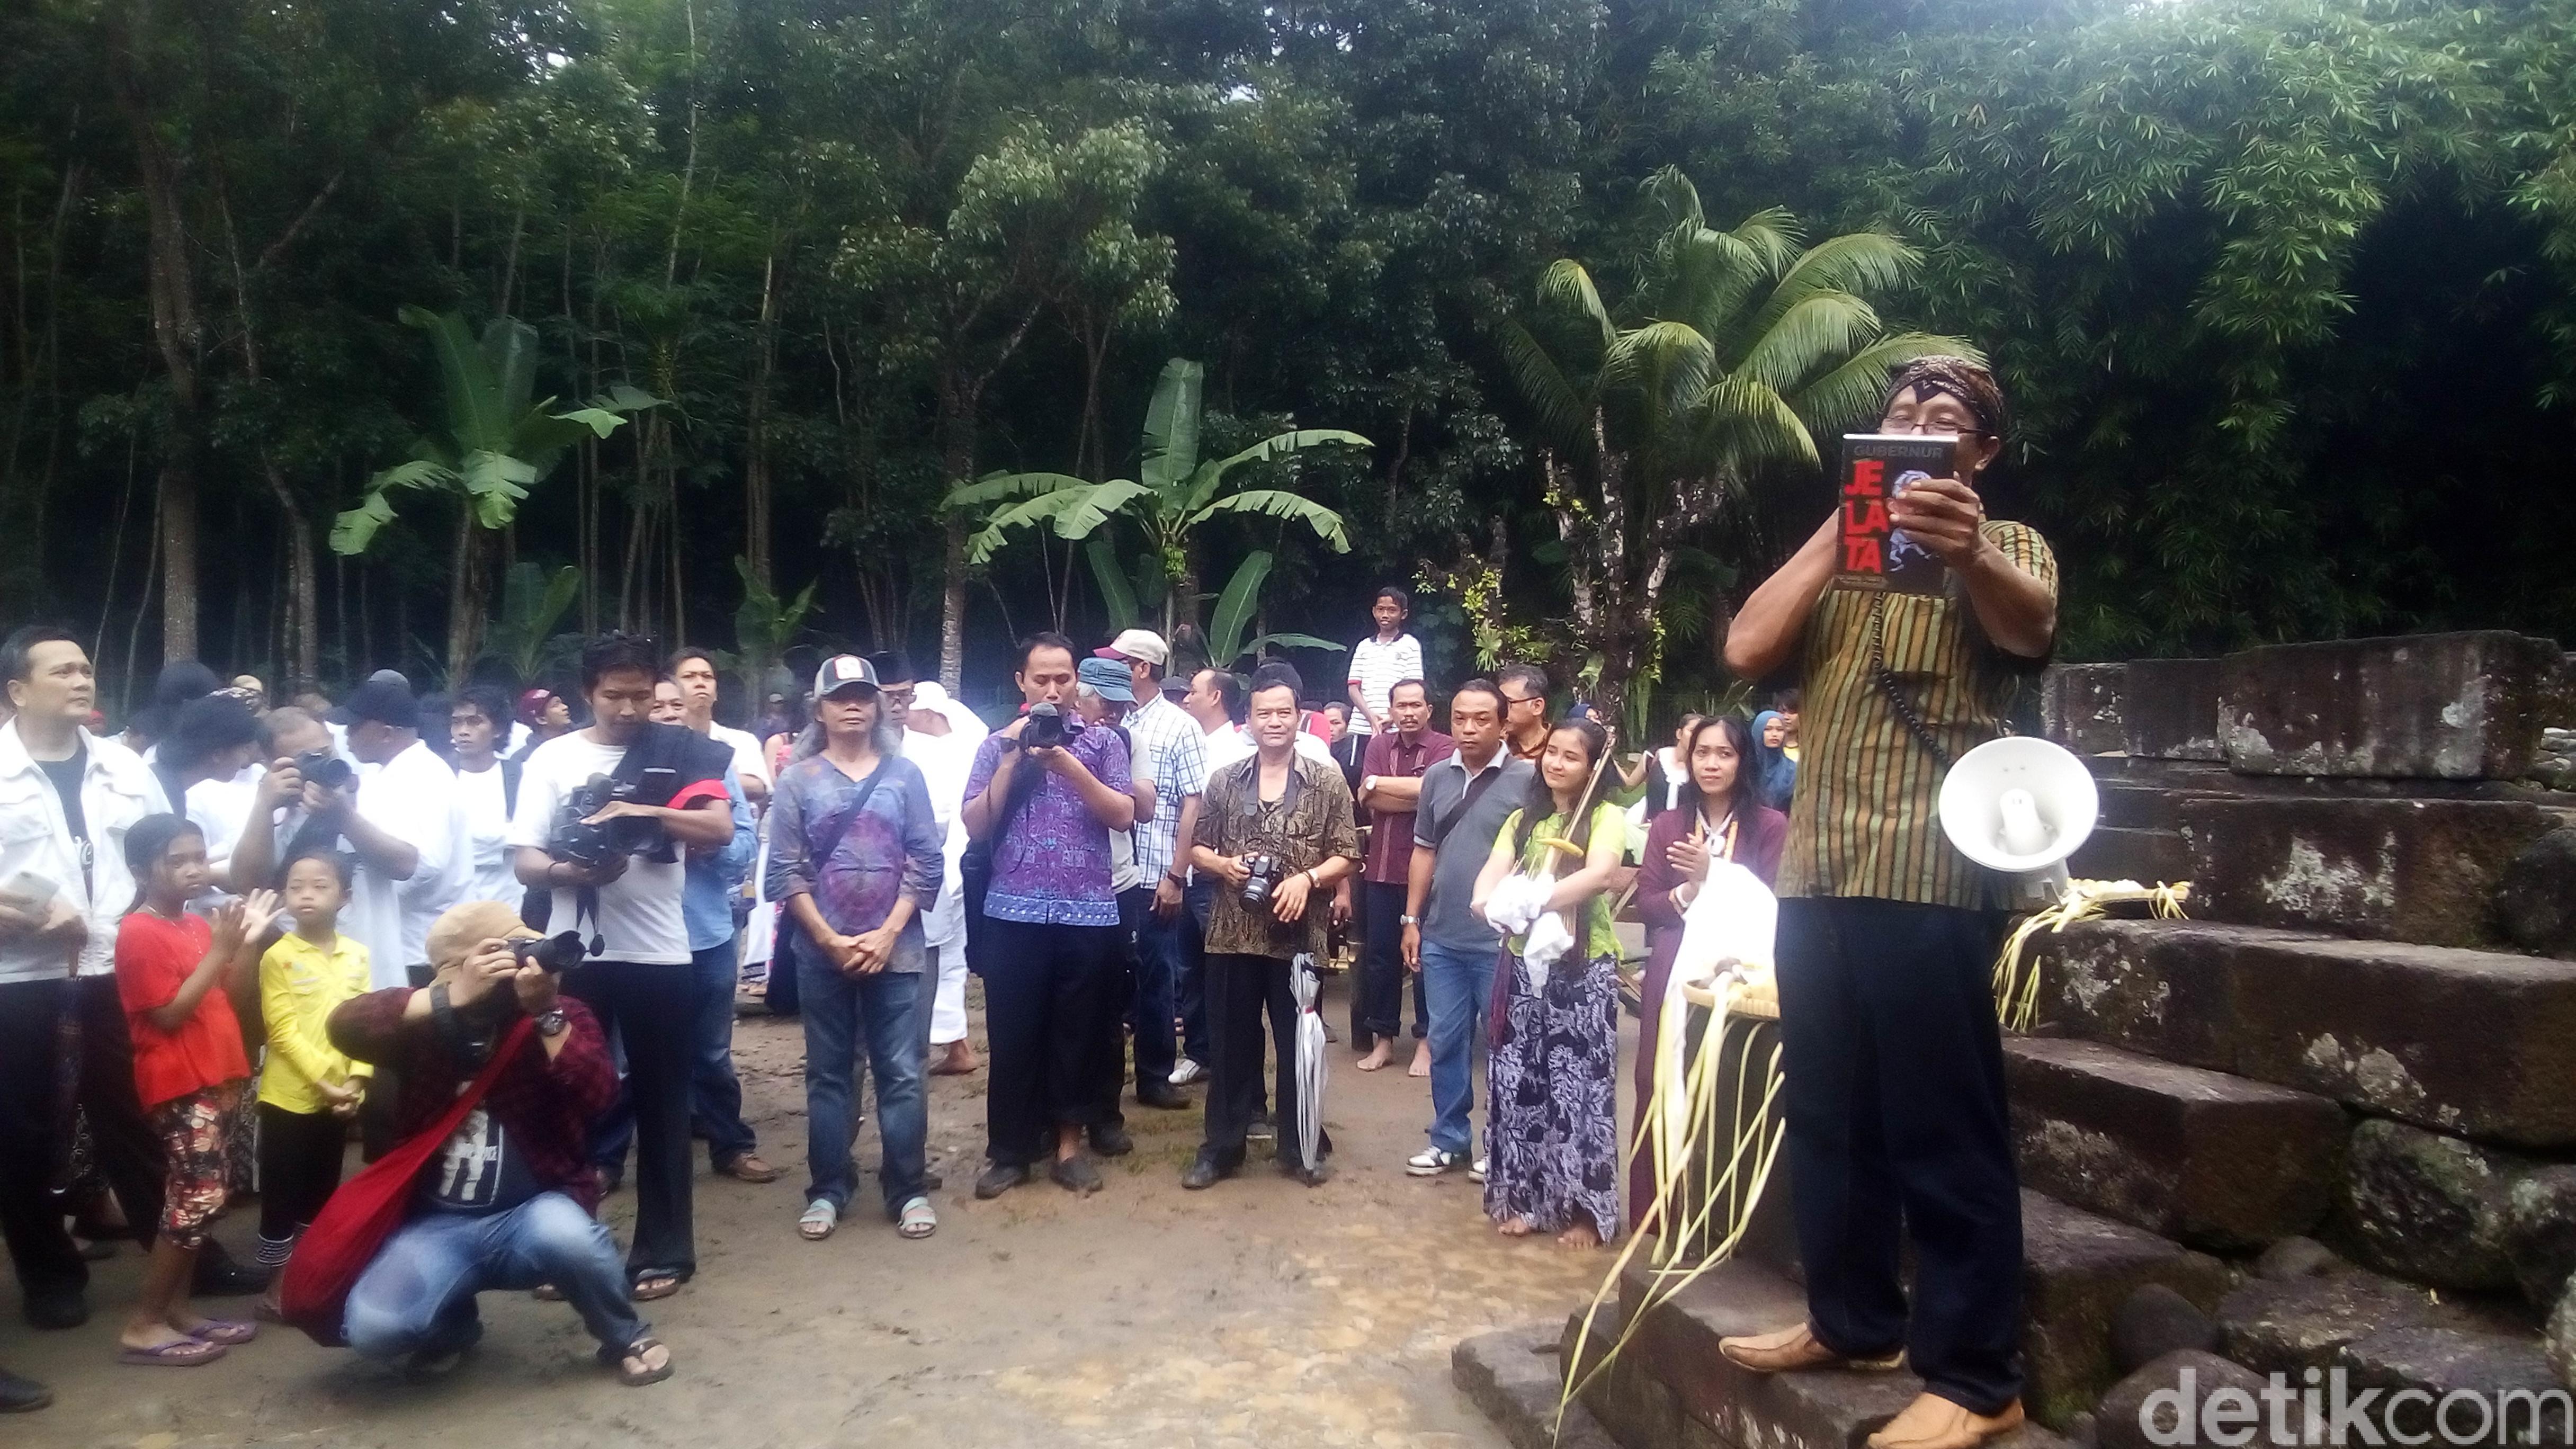 Buku Berisi Kegilaan Gubernur Ganjar Diluncurkan Candi Gunung Wukir Kab